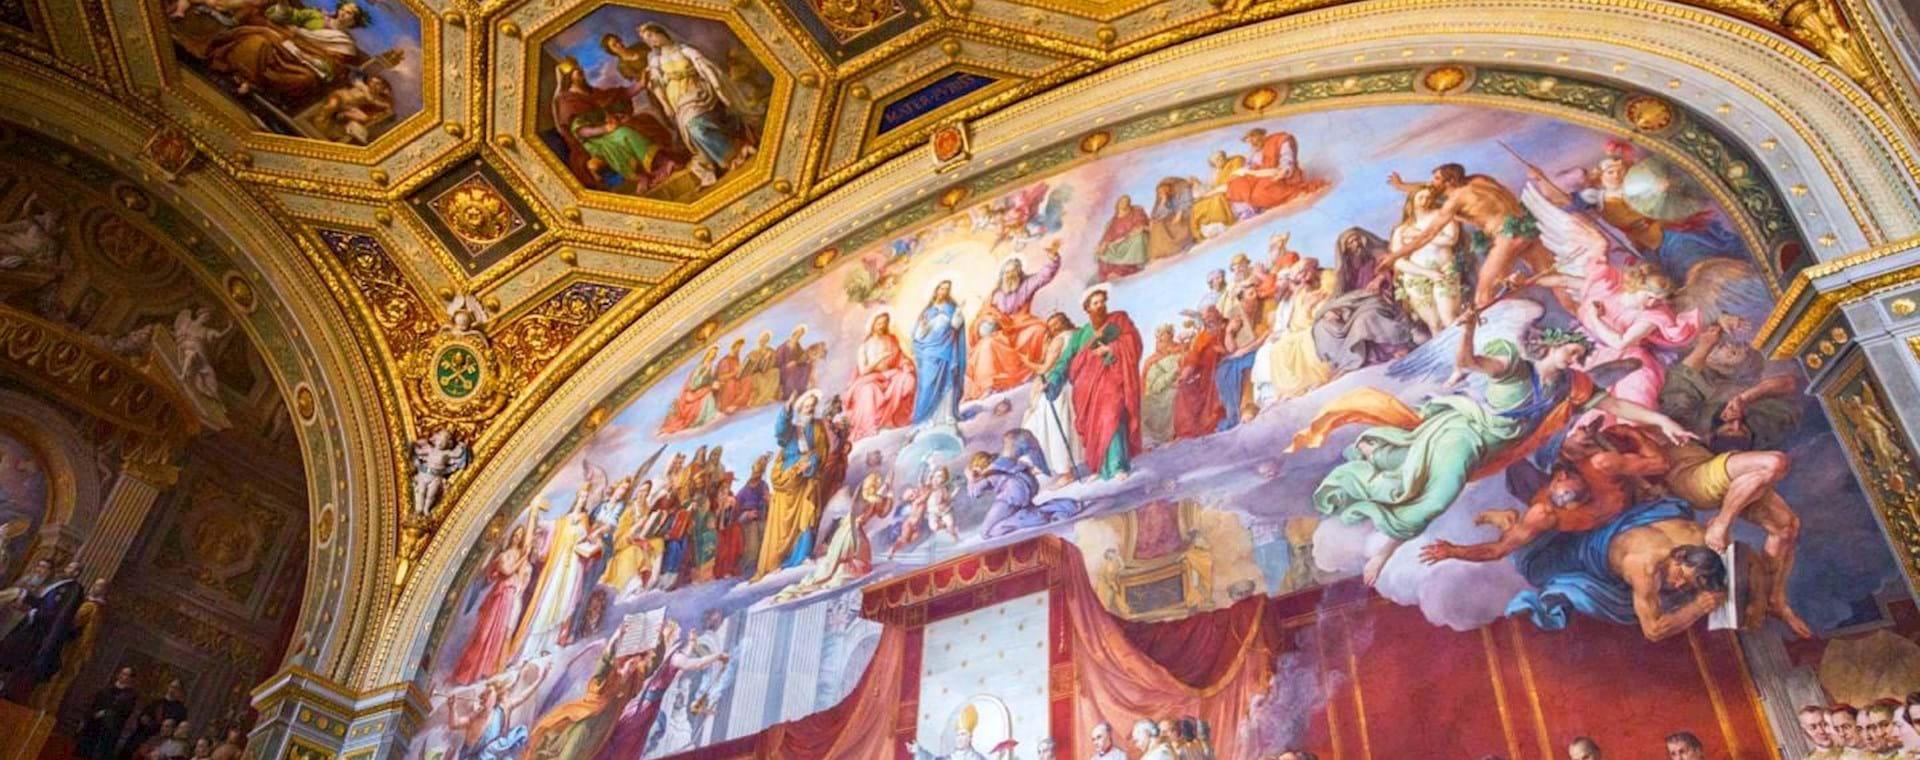 Vatican Museums & Sistine Chapel Entrance Tickets